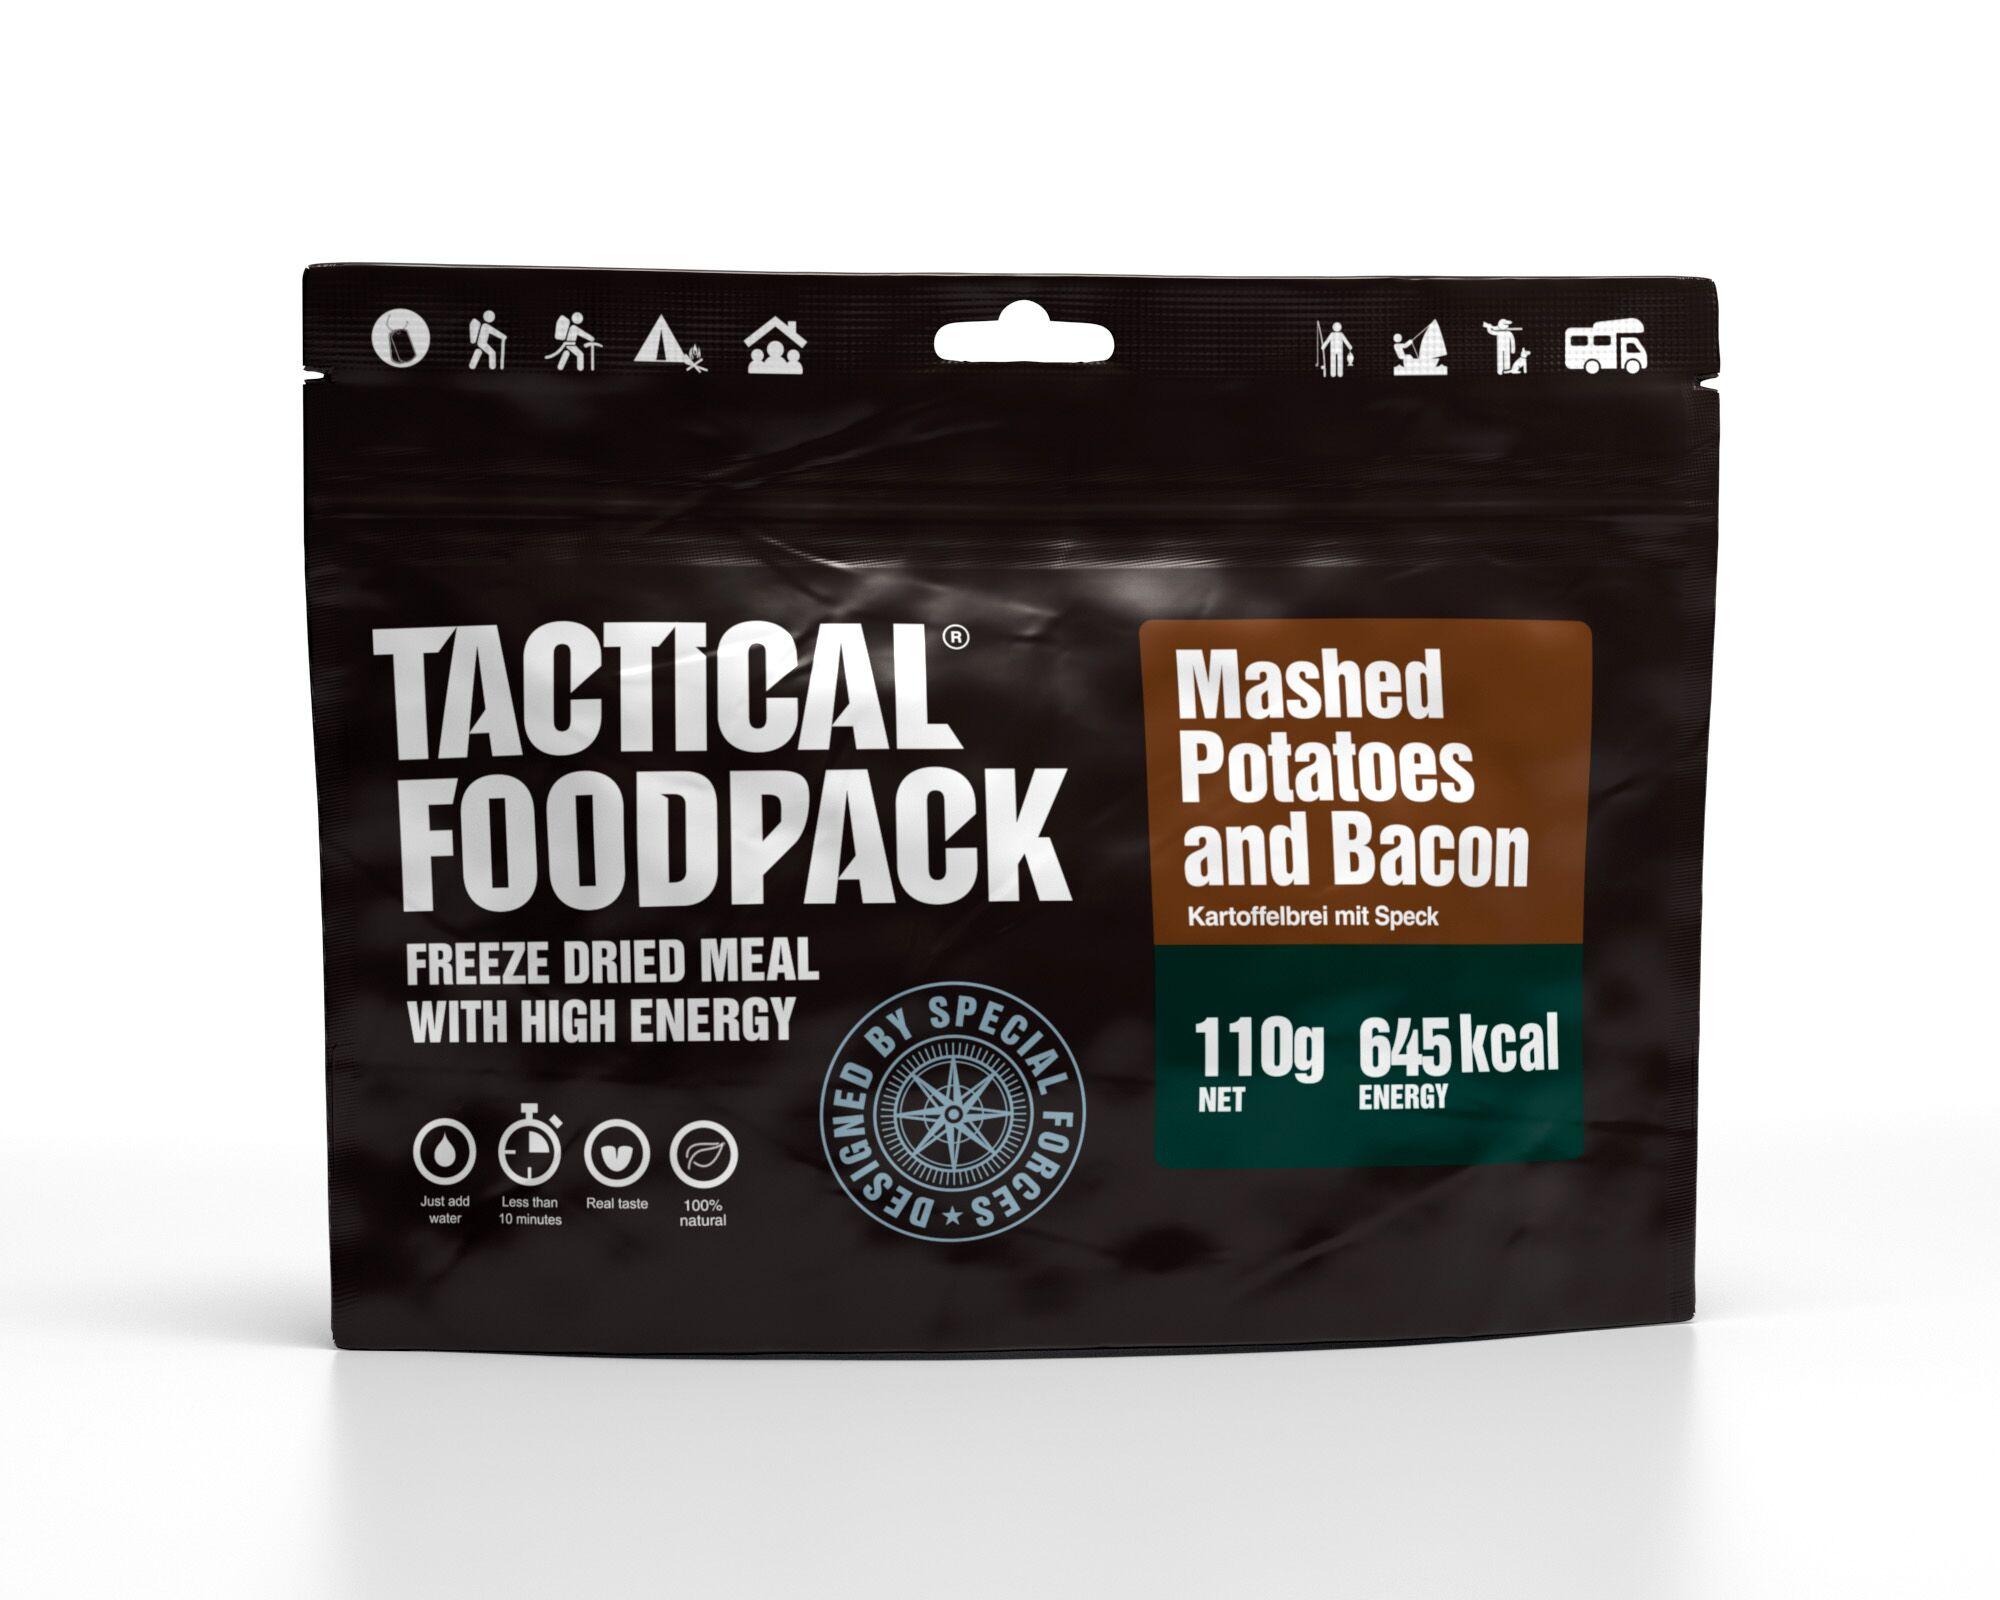 Dehidrirana hrana Tactical Foodpack - Mashed Potatoes and Bacon , B33 army shop at www.opremljen.si, trgovina z vojaško opremo, vojaška trgovina